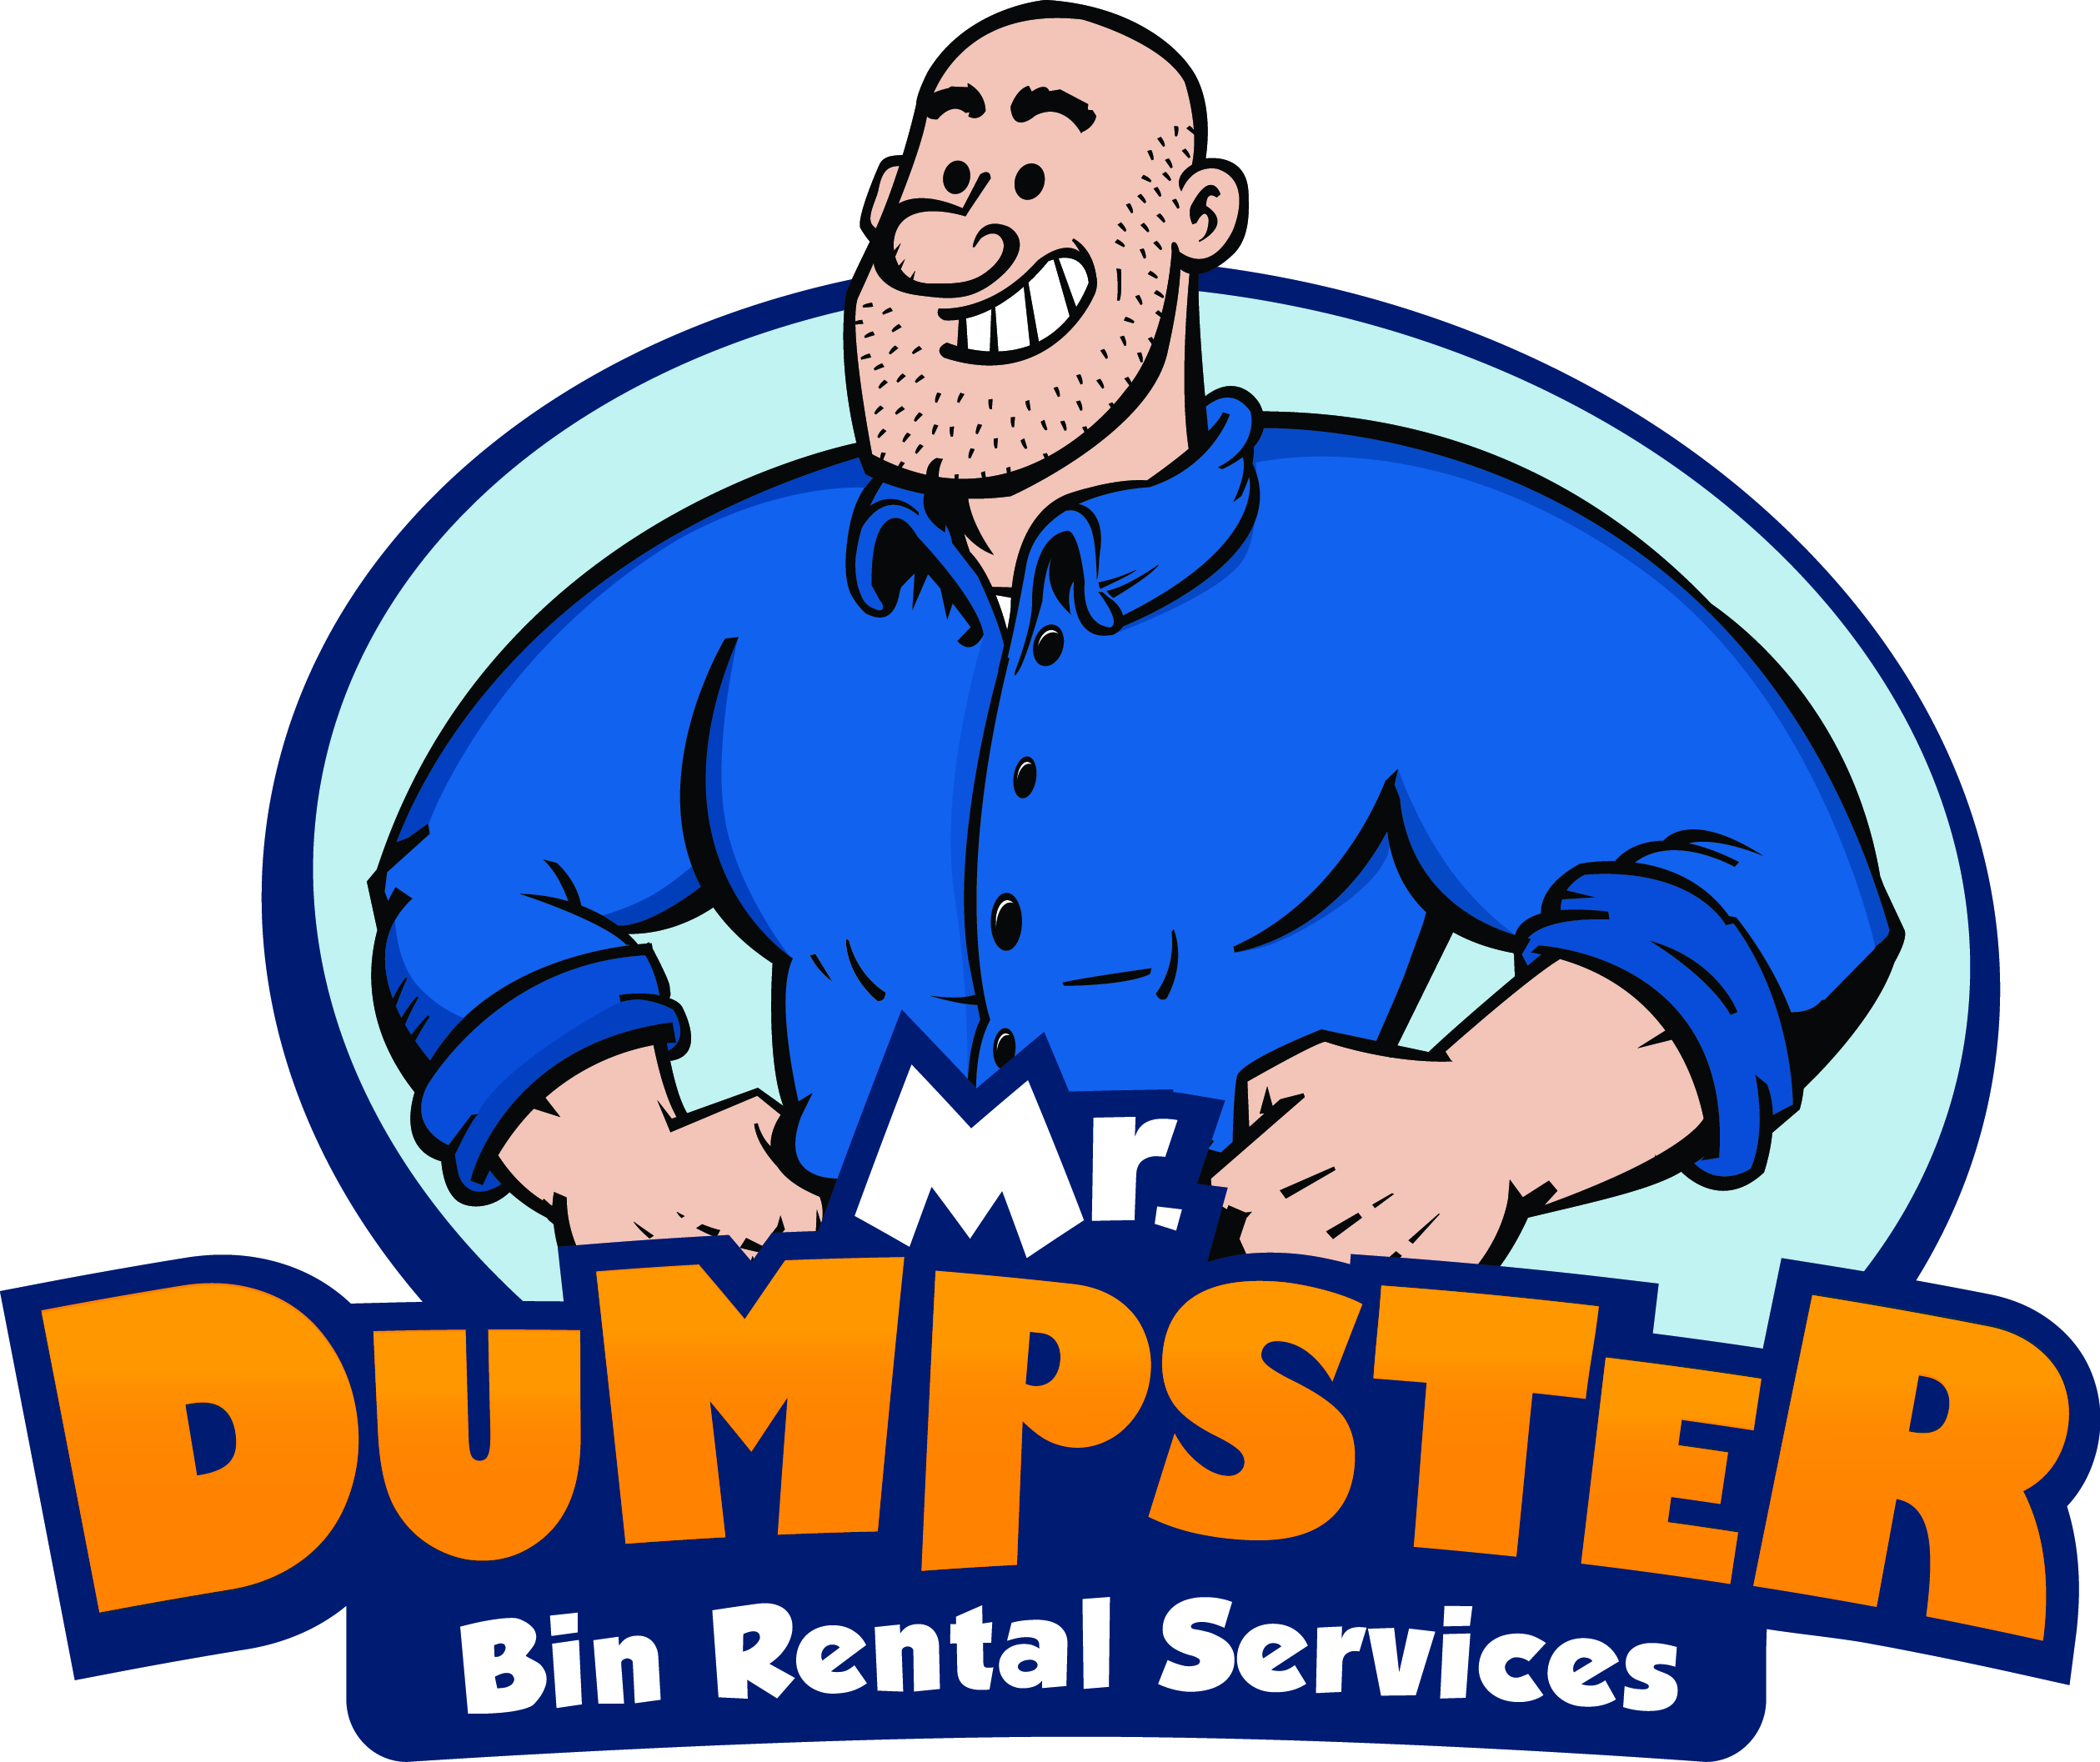 Mr. Dumpster